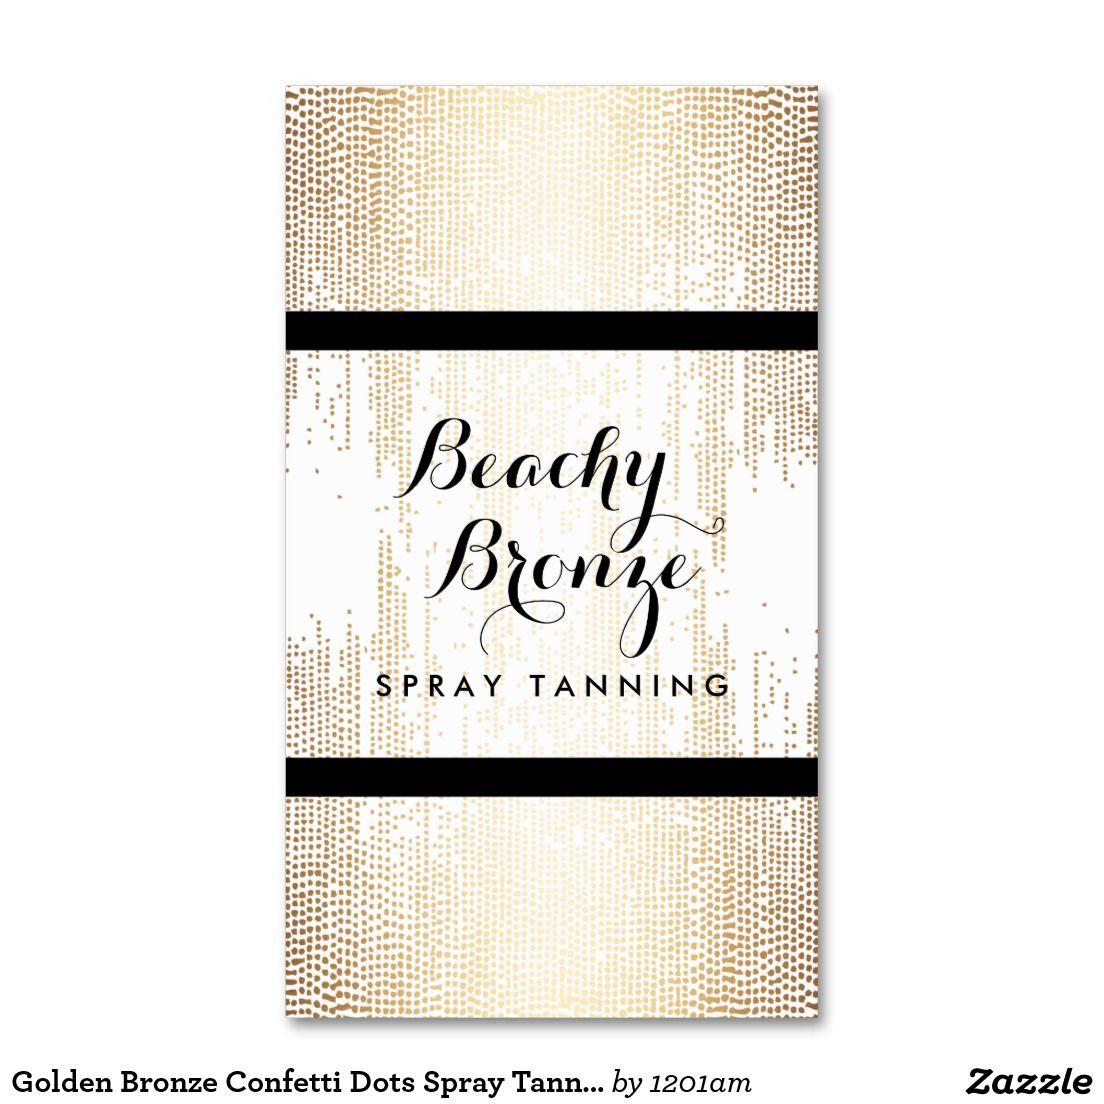 Golden Bronze Confetti Dots Spray Tanning Salon Business Card ...